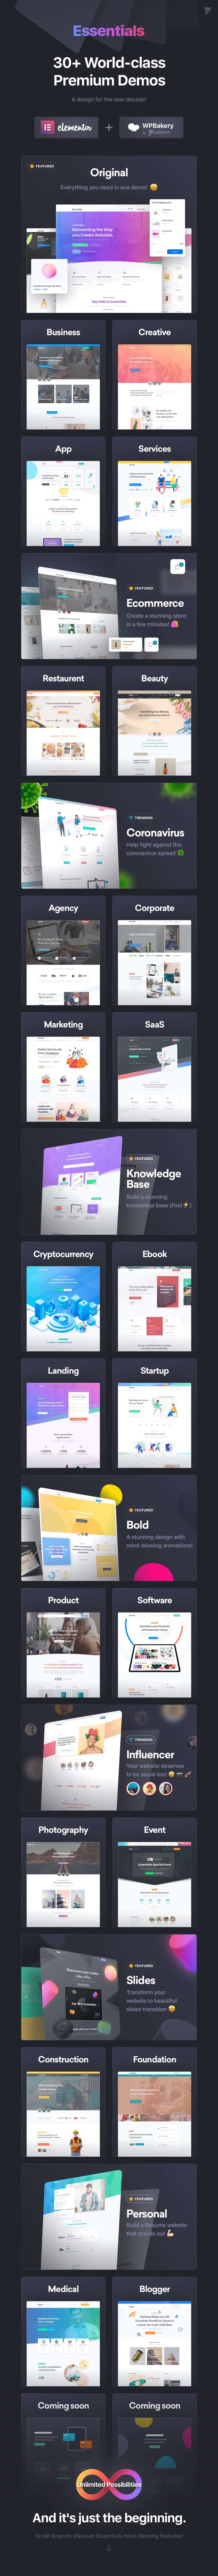 Essentials | Multipurpose WordPress Theme - 9